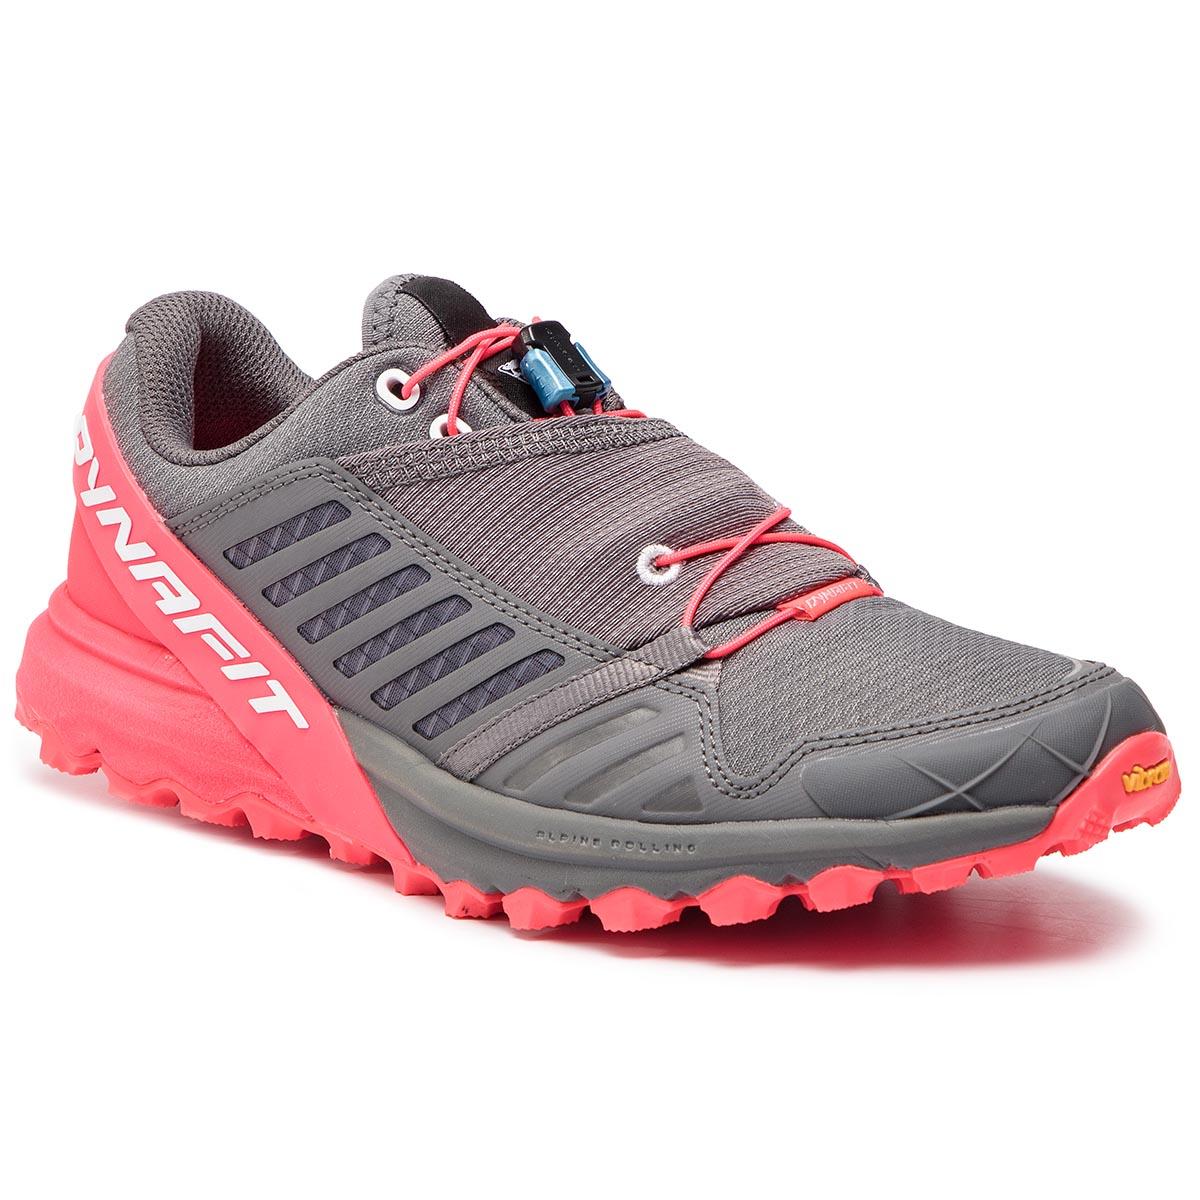 Feline 4504 64023 Shoes Fuchsiaglory Ultra Trekker Dynafit UqVSzMp